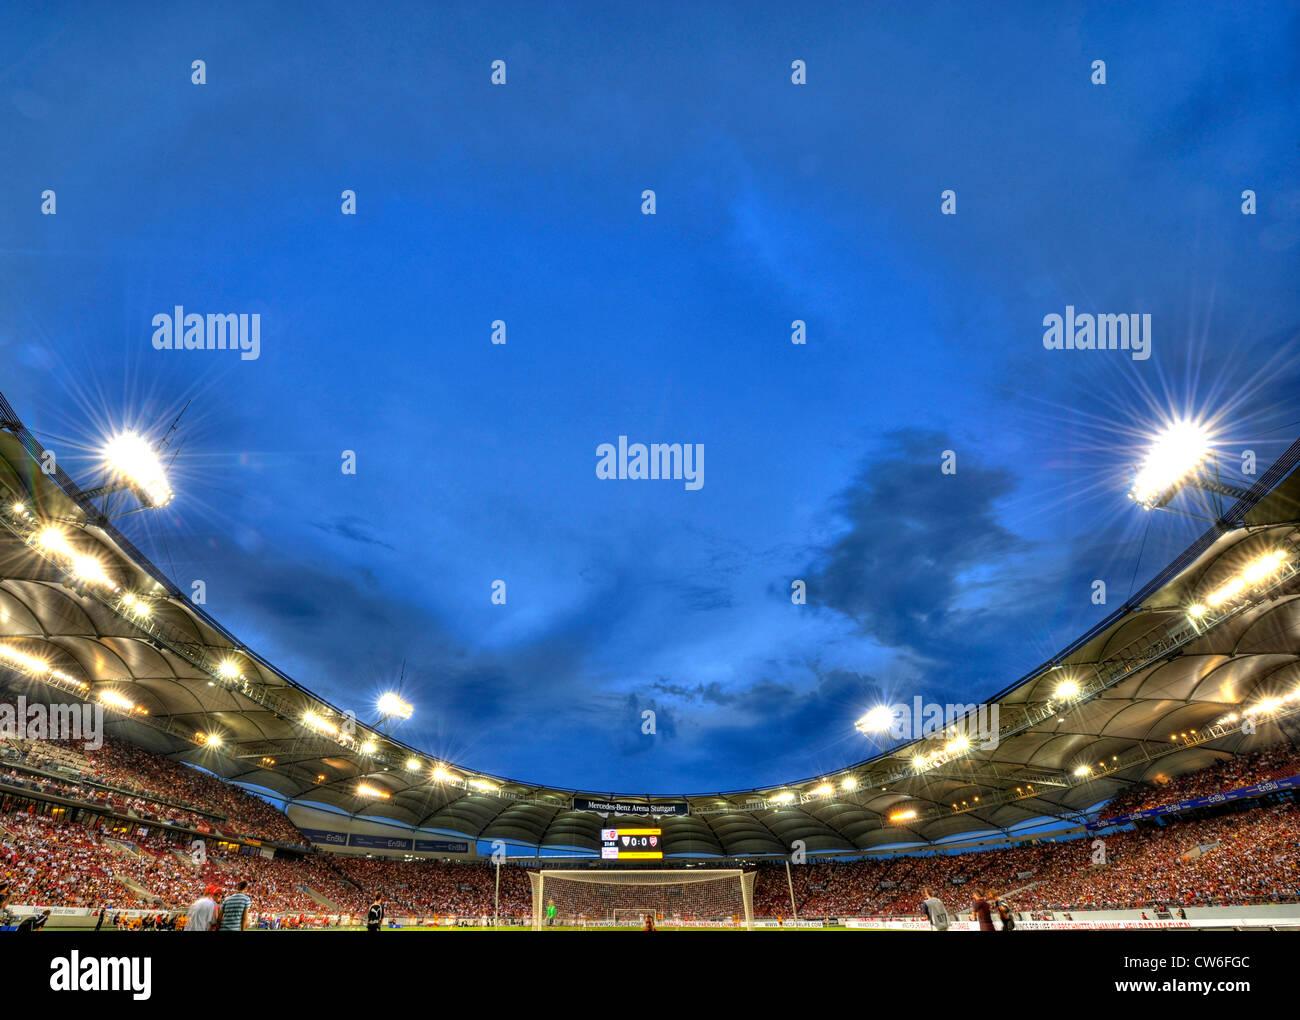 Mercedes Benz Stadium Stock Photos Amp Mercedes Benz Stadium